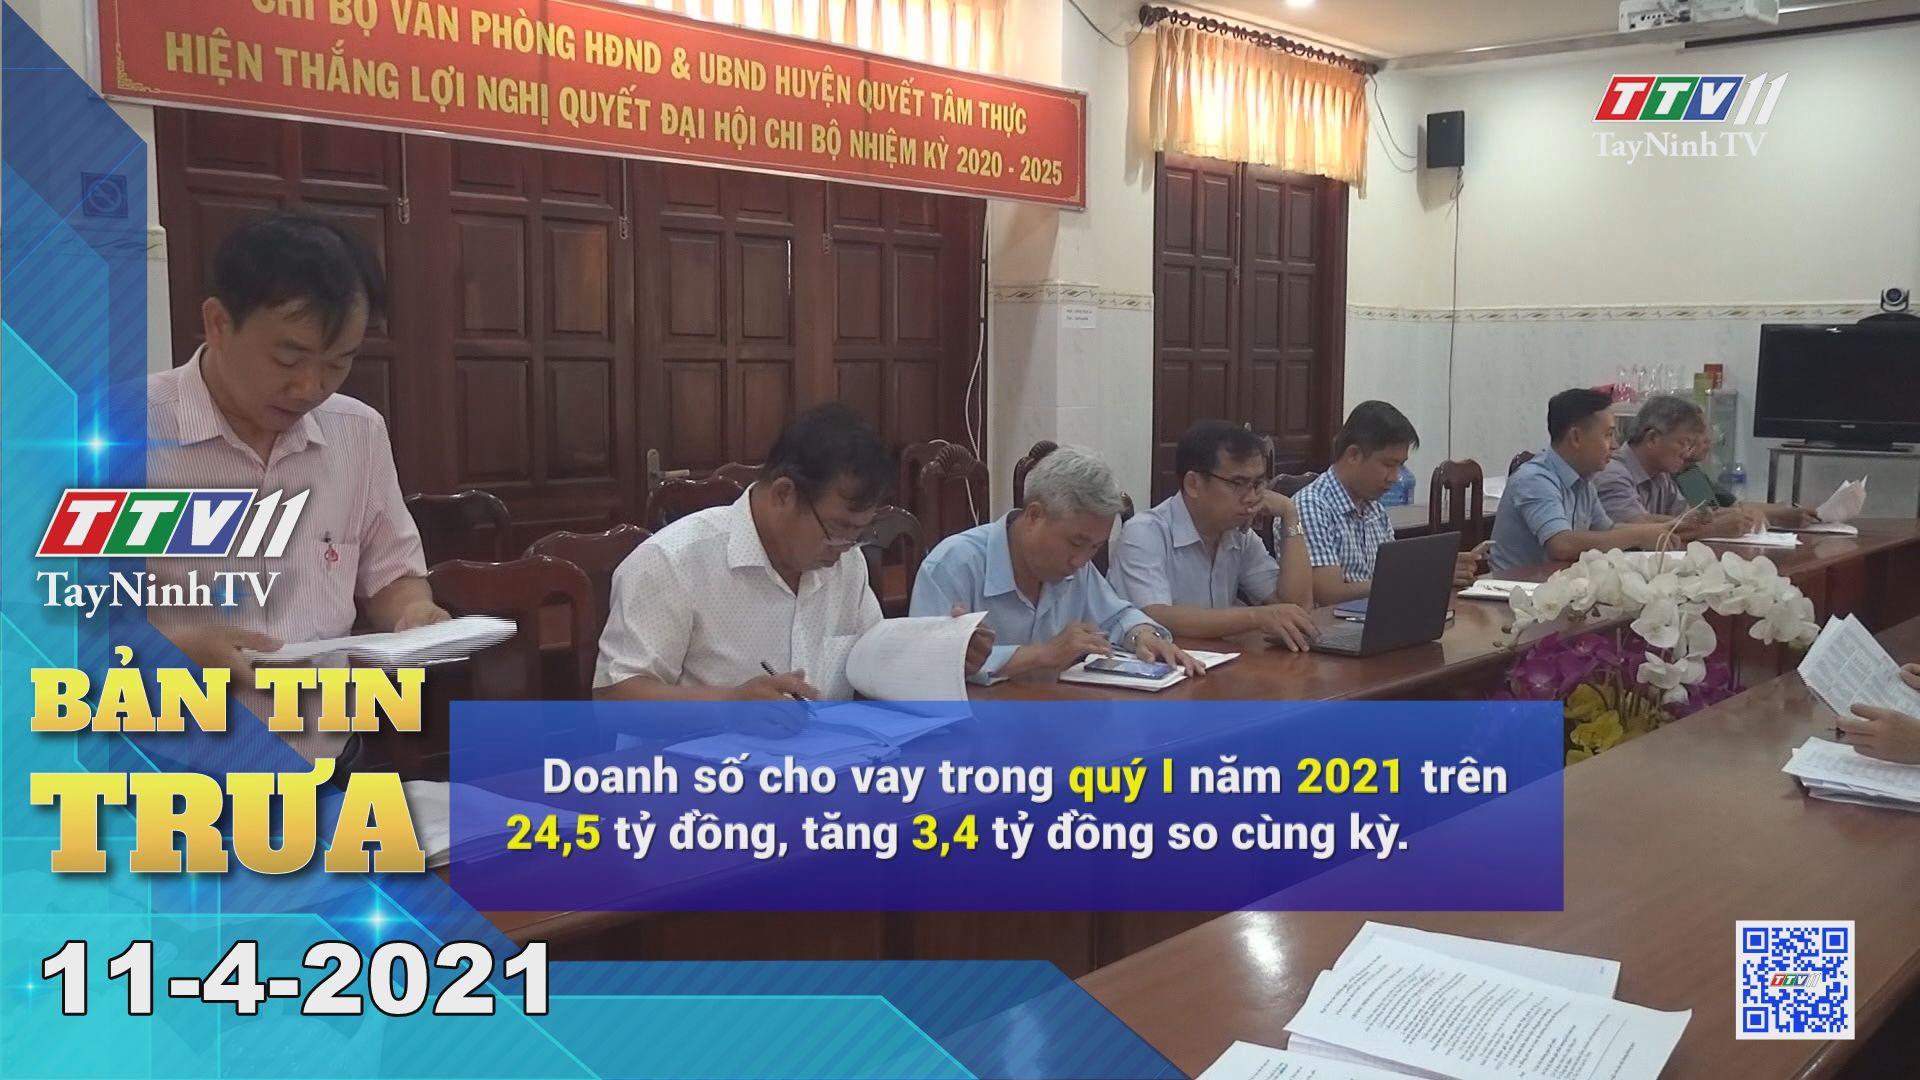 Bản tin trưa 11-4-2021 | Tin tức hôm nay | TayNinhTV